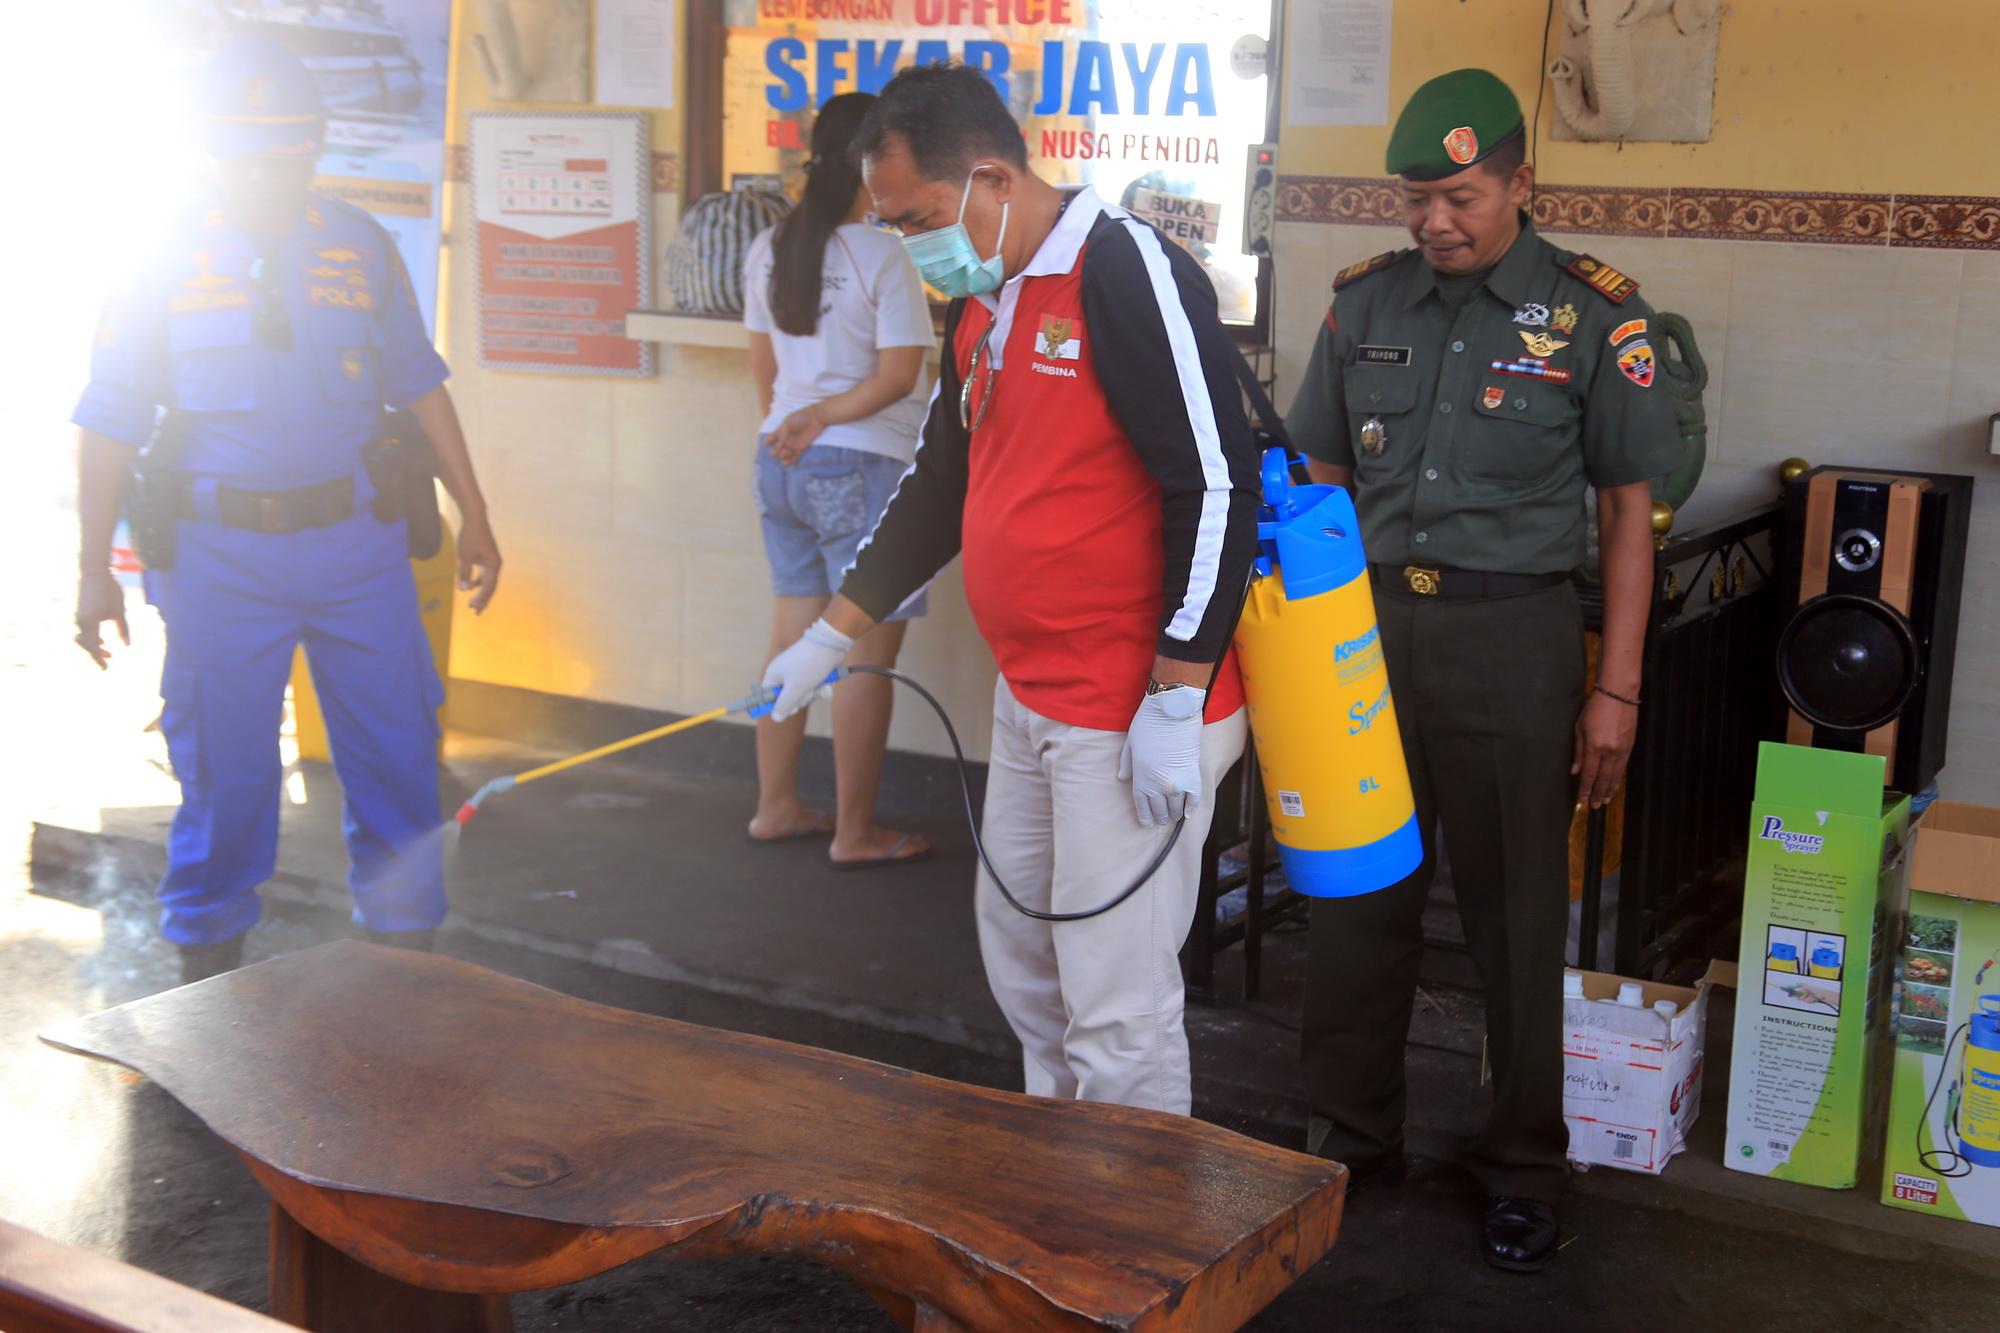 WABUP Klungkung, I Made Kasta, melakukan penyemprotan disinfektan di Pelabuhan Banjar Bias Kusamba, Minggu (15/3/2020). Foto: ketut bagus arjana